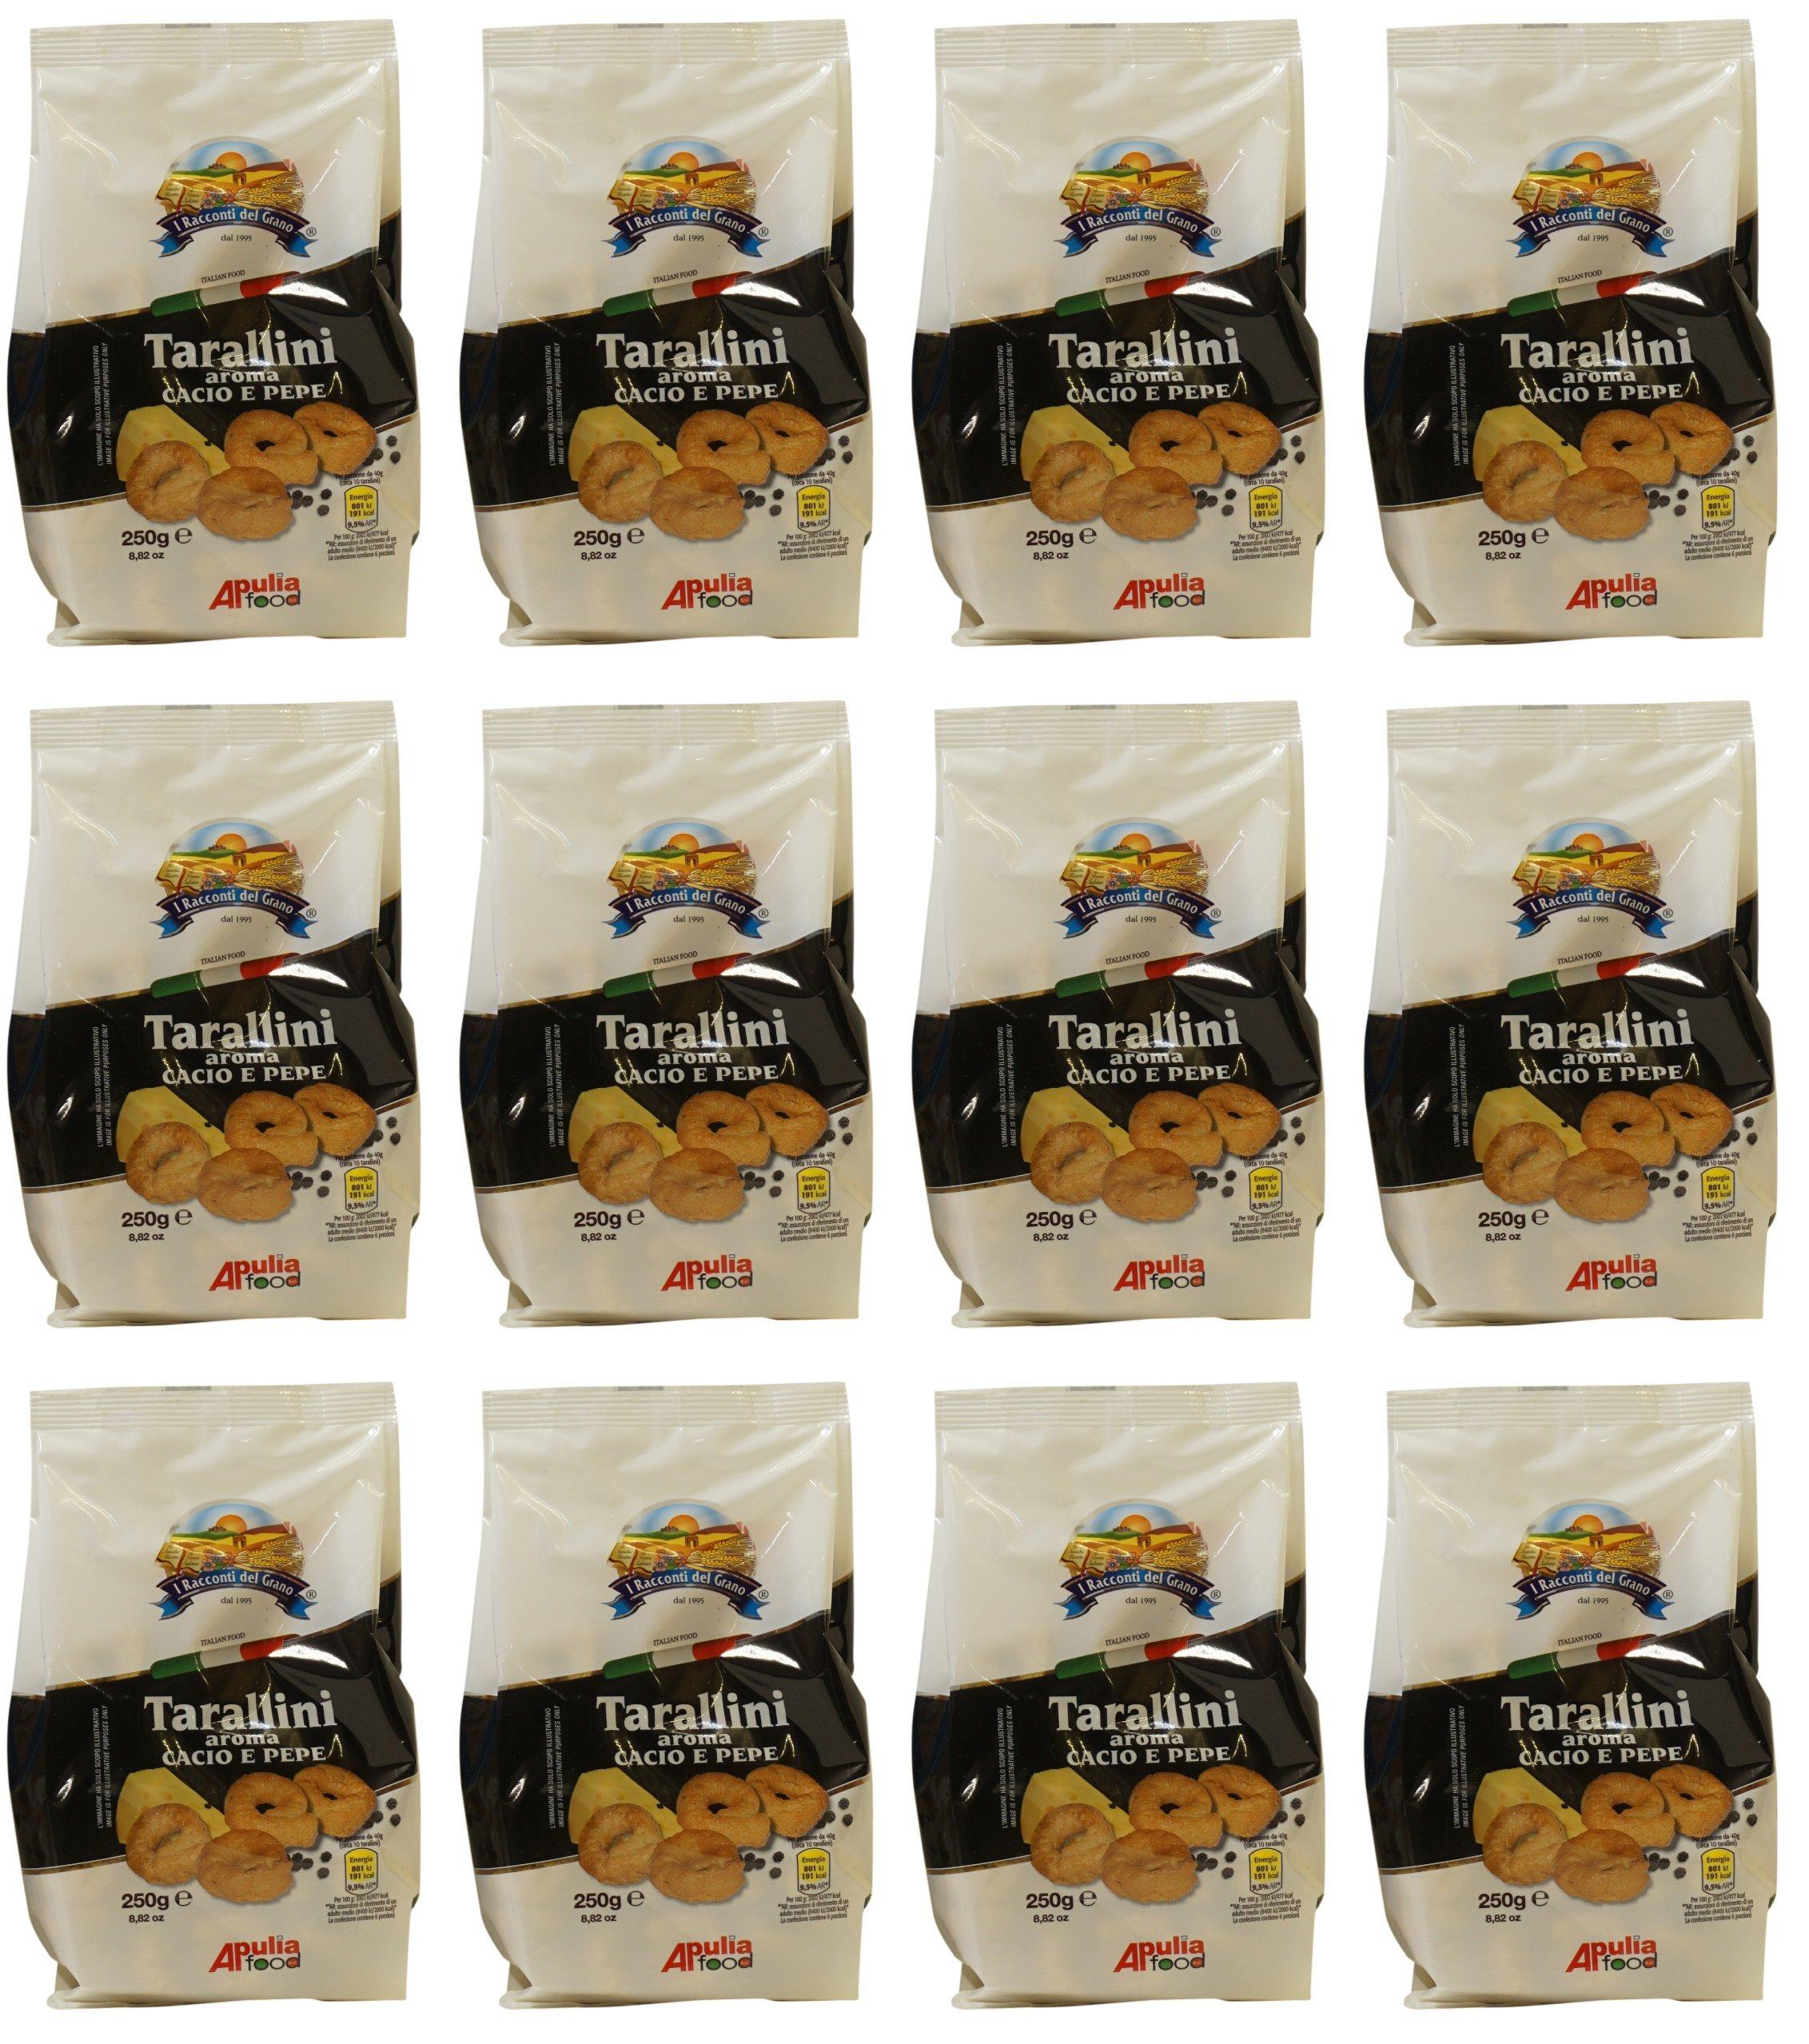 I Racconti del Grano: ''Tarallini Cacio e Pepe '' - Cheese and Pepper Taralli 8.82 Ounce (250gr) Package (Pack of 12) [ Italian Import ]